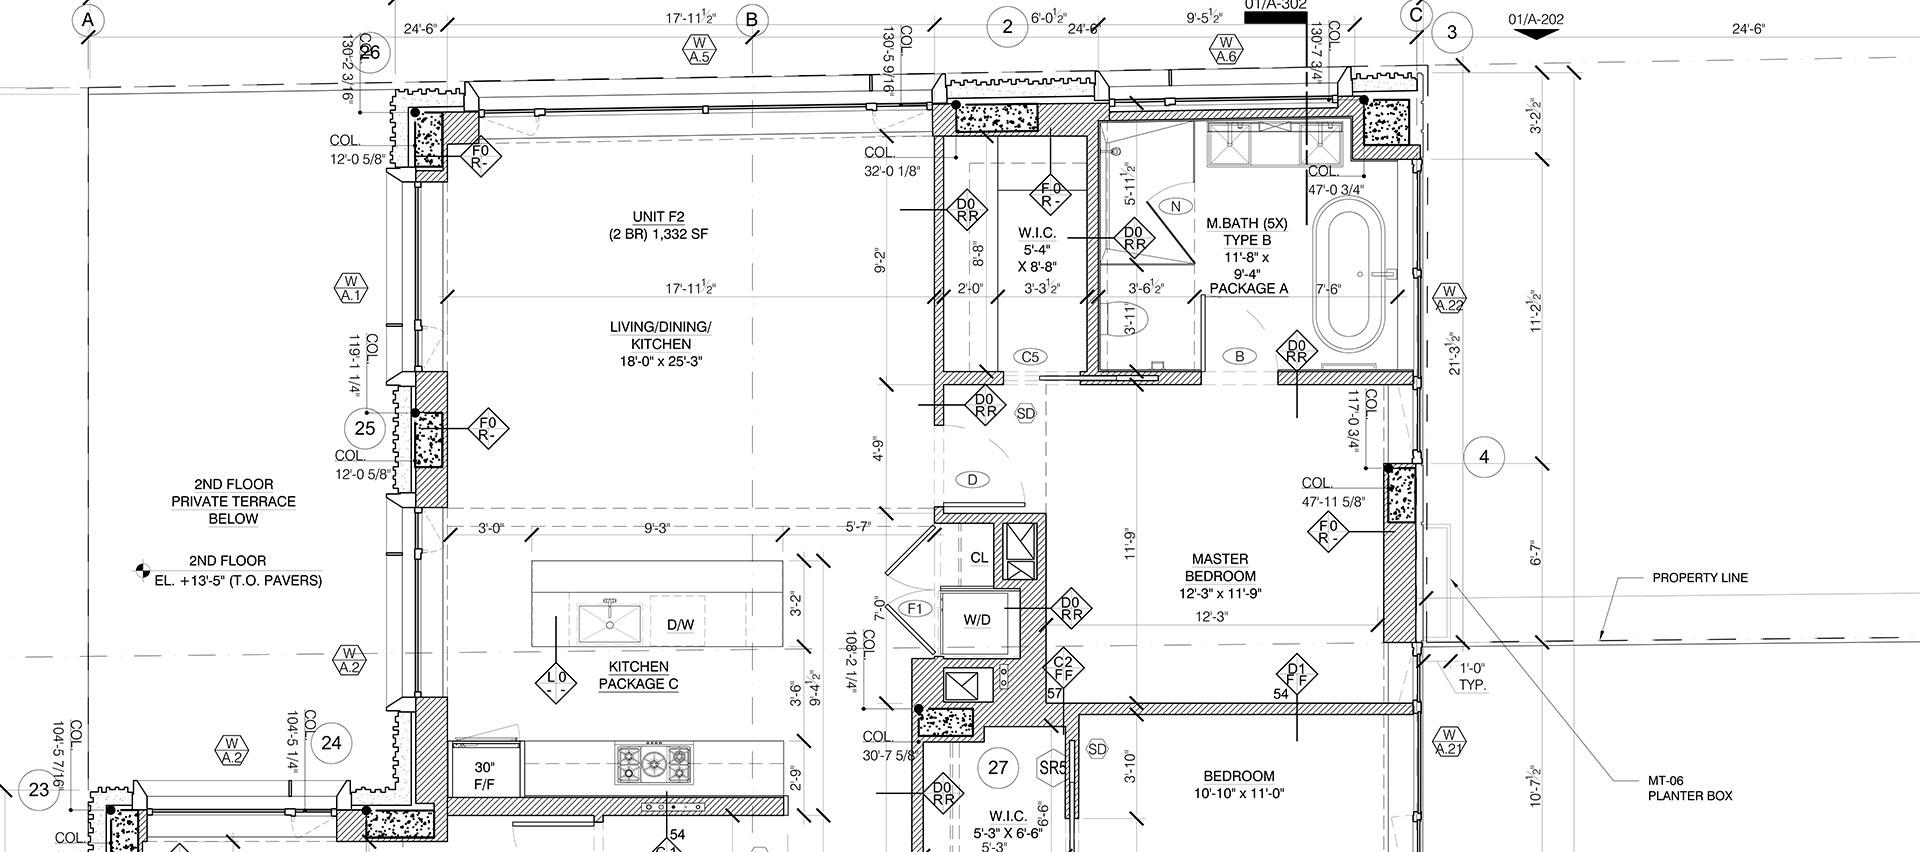 Architectural CAD Documentation